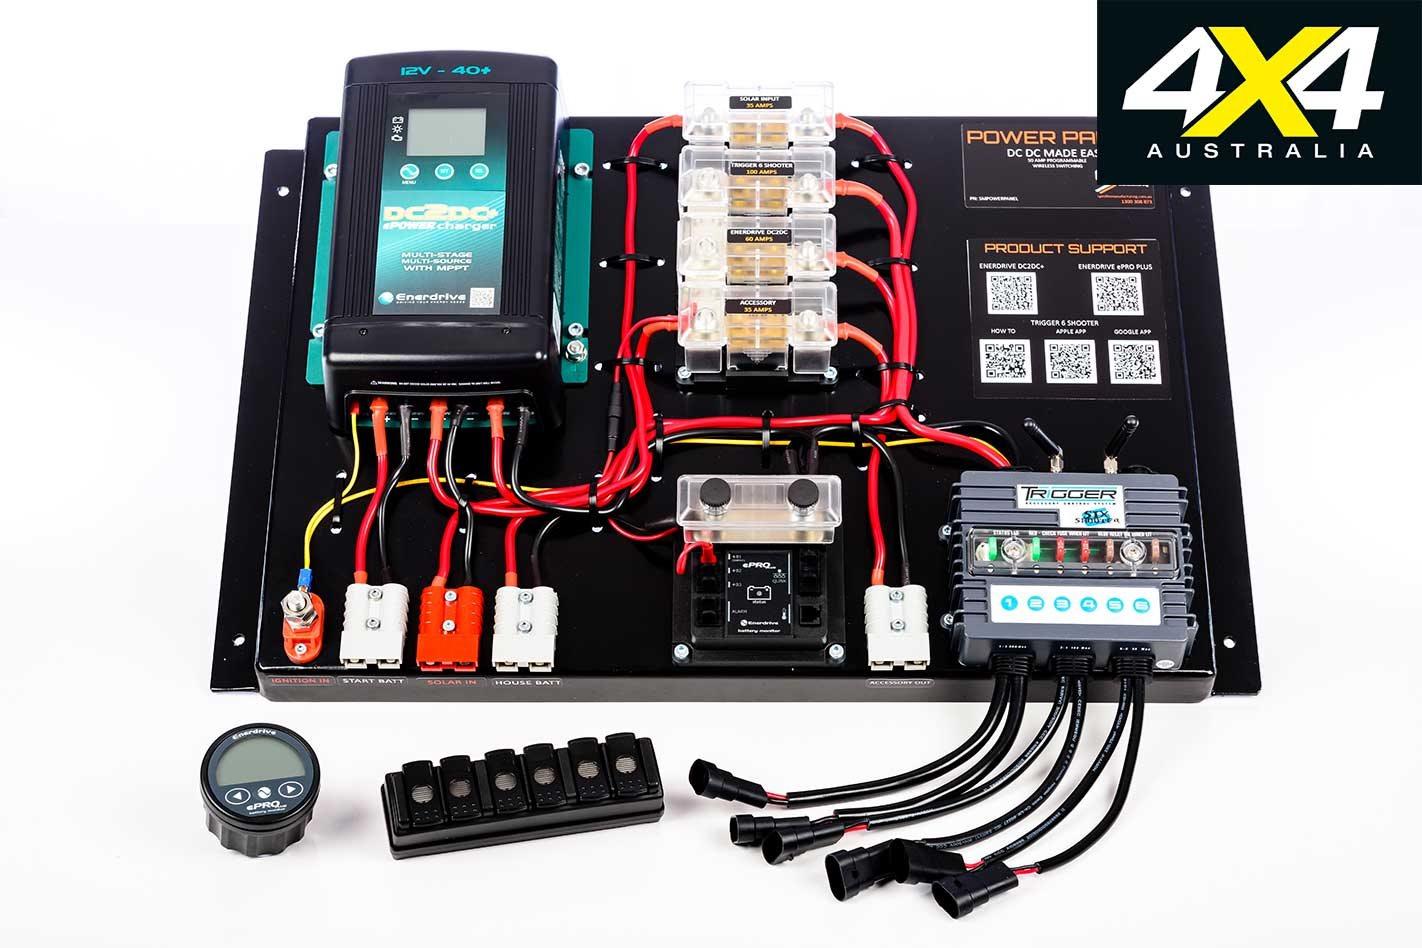 New 4x4 power management equipment | 4x4 Australia